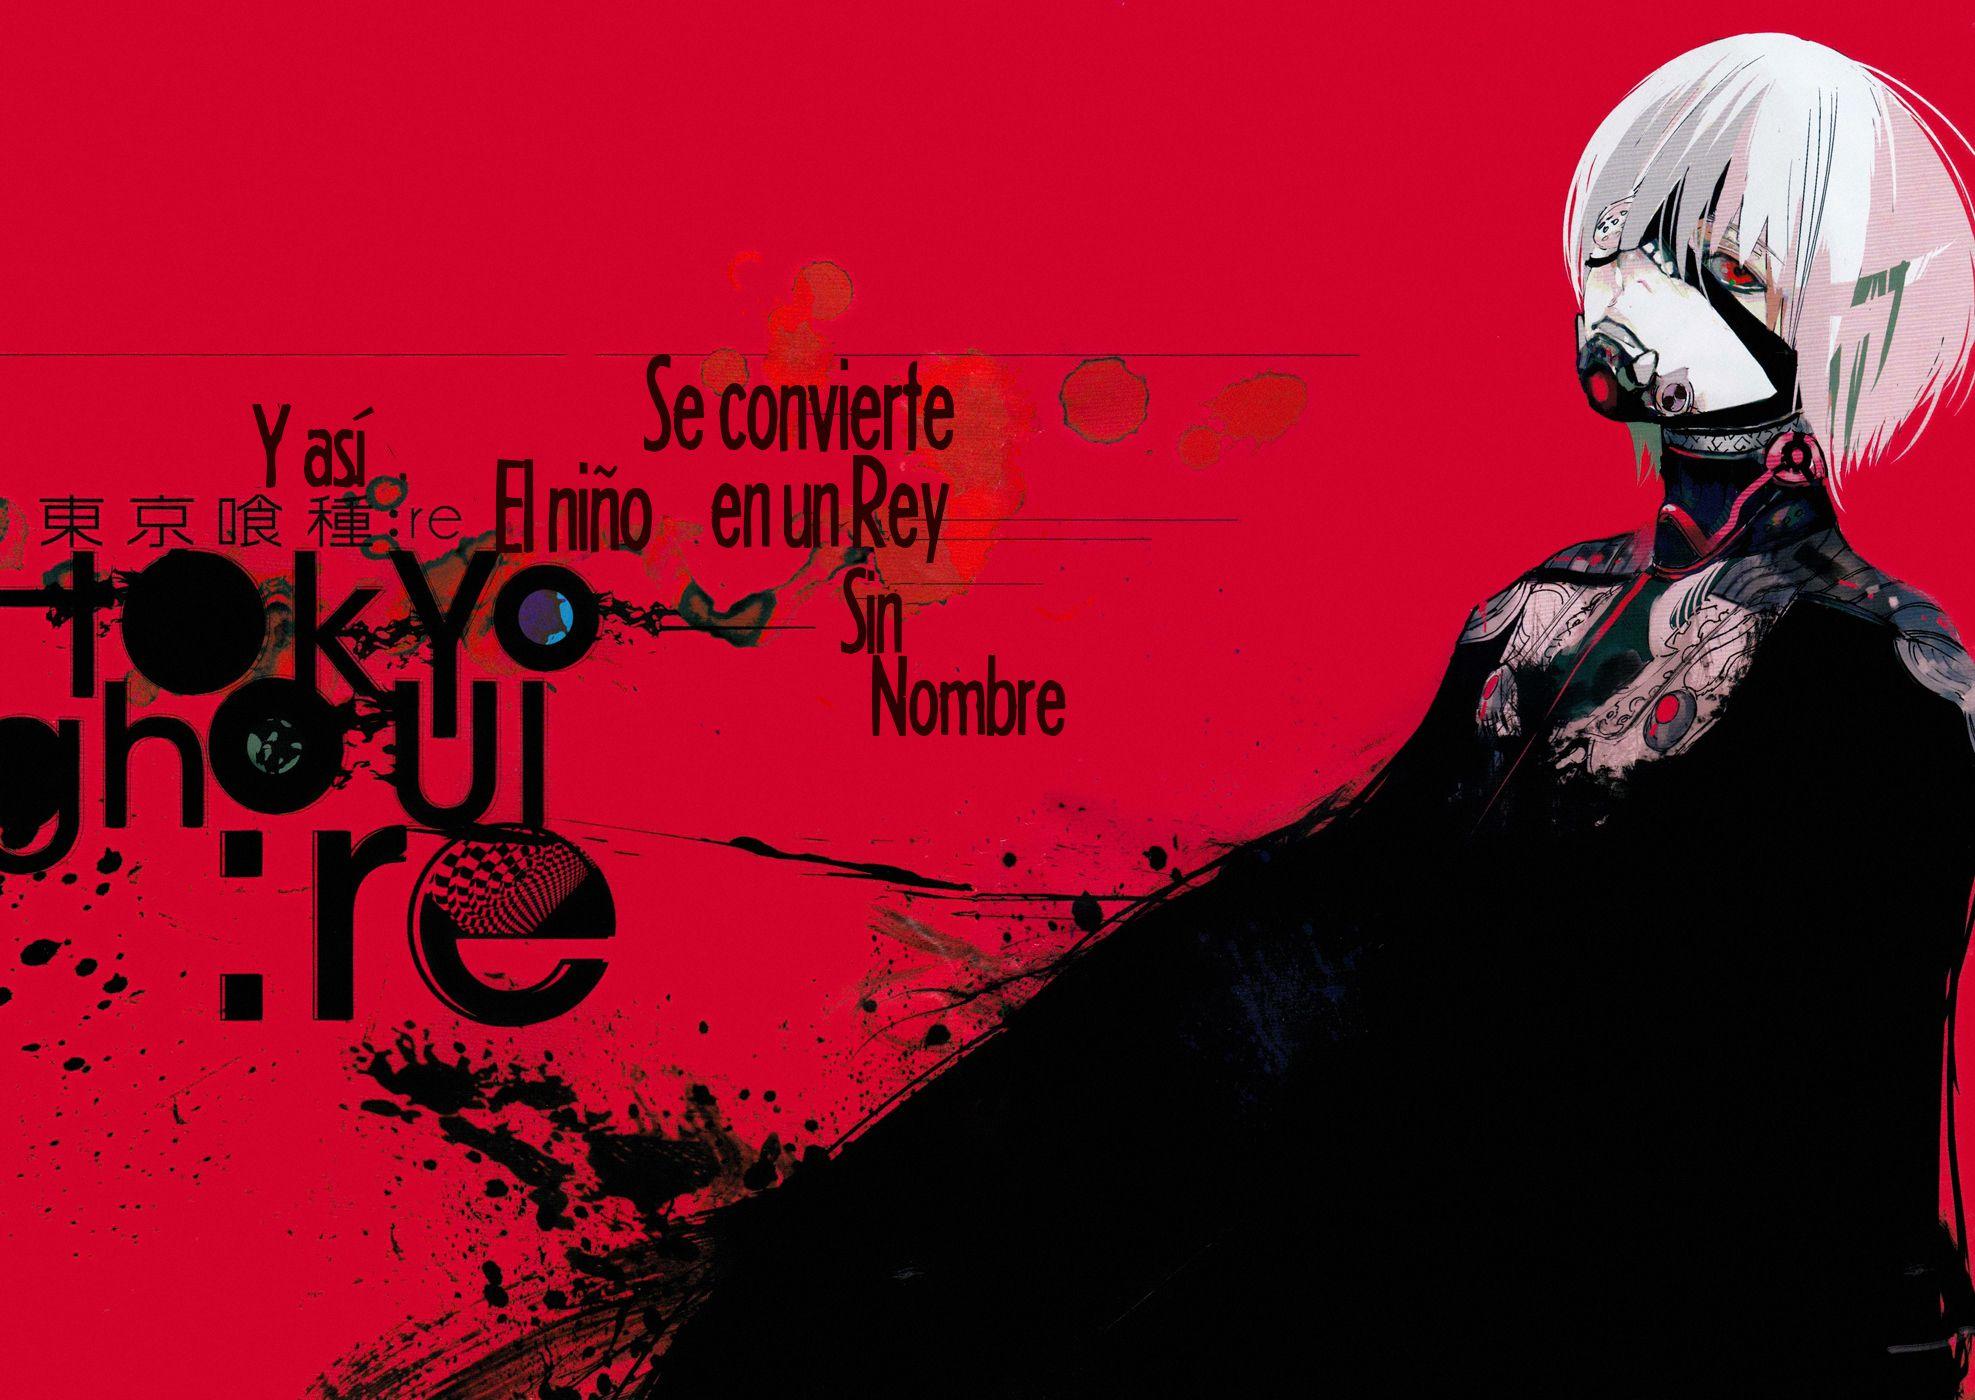 http://c5.ninemanga.com/es_manga/pic2/59/59/515394/d0737a771fc9ea34b19137c37e7eecf7.jpg Page 2